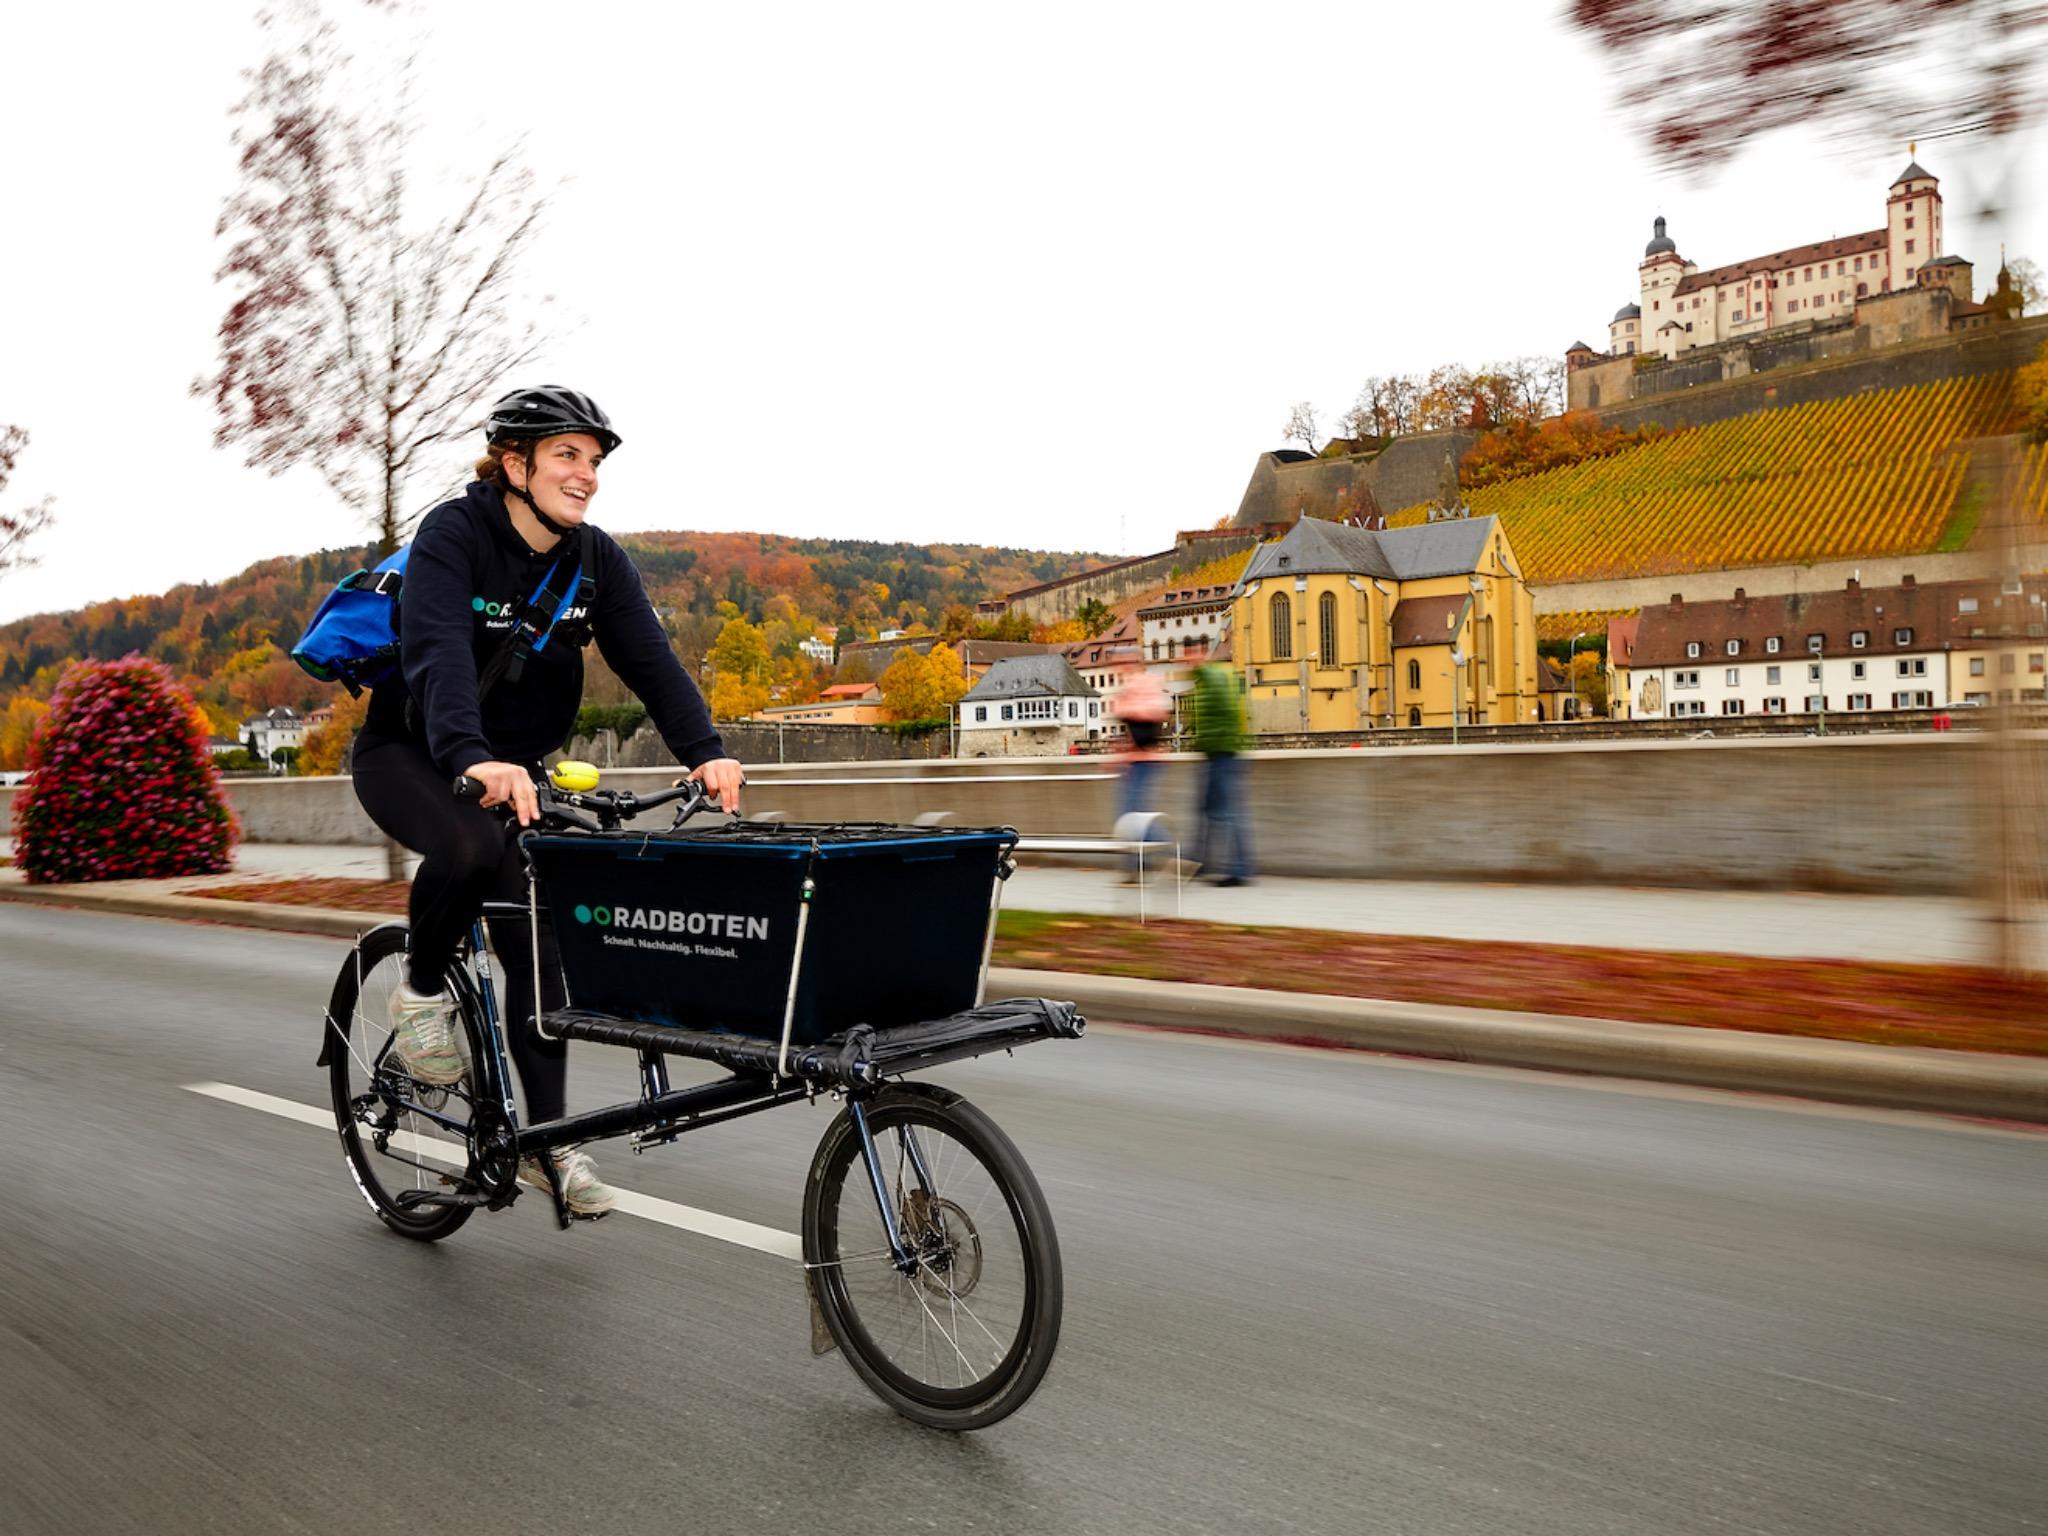 Nachhaltiger Transport mit Logistikpartner Radbote! Foto: Würzburg macht Spaß e.V.